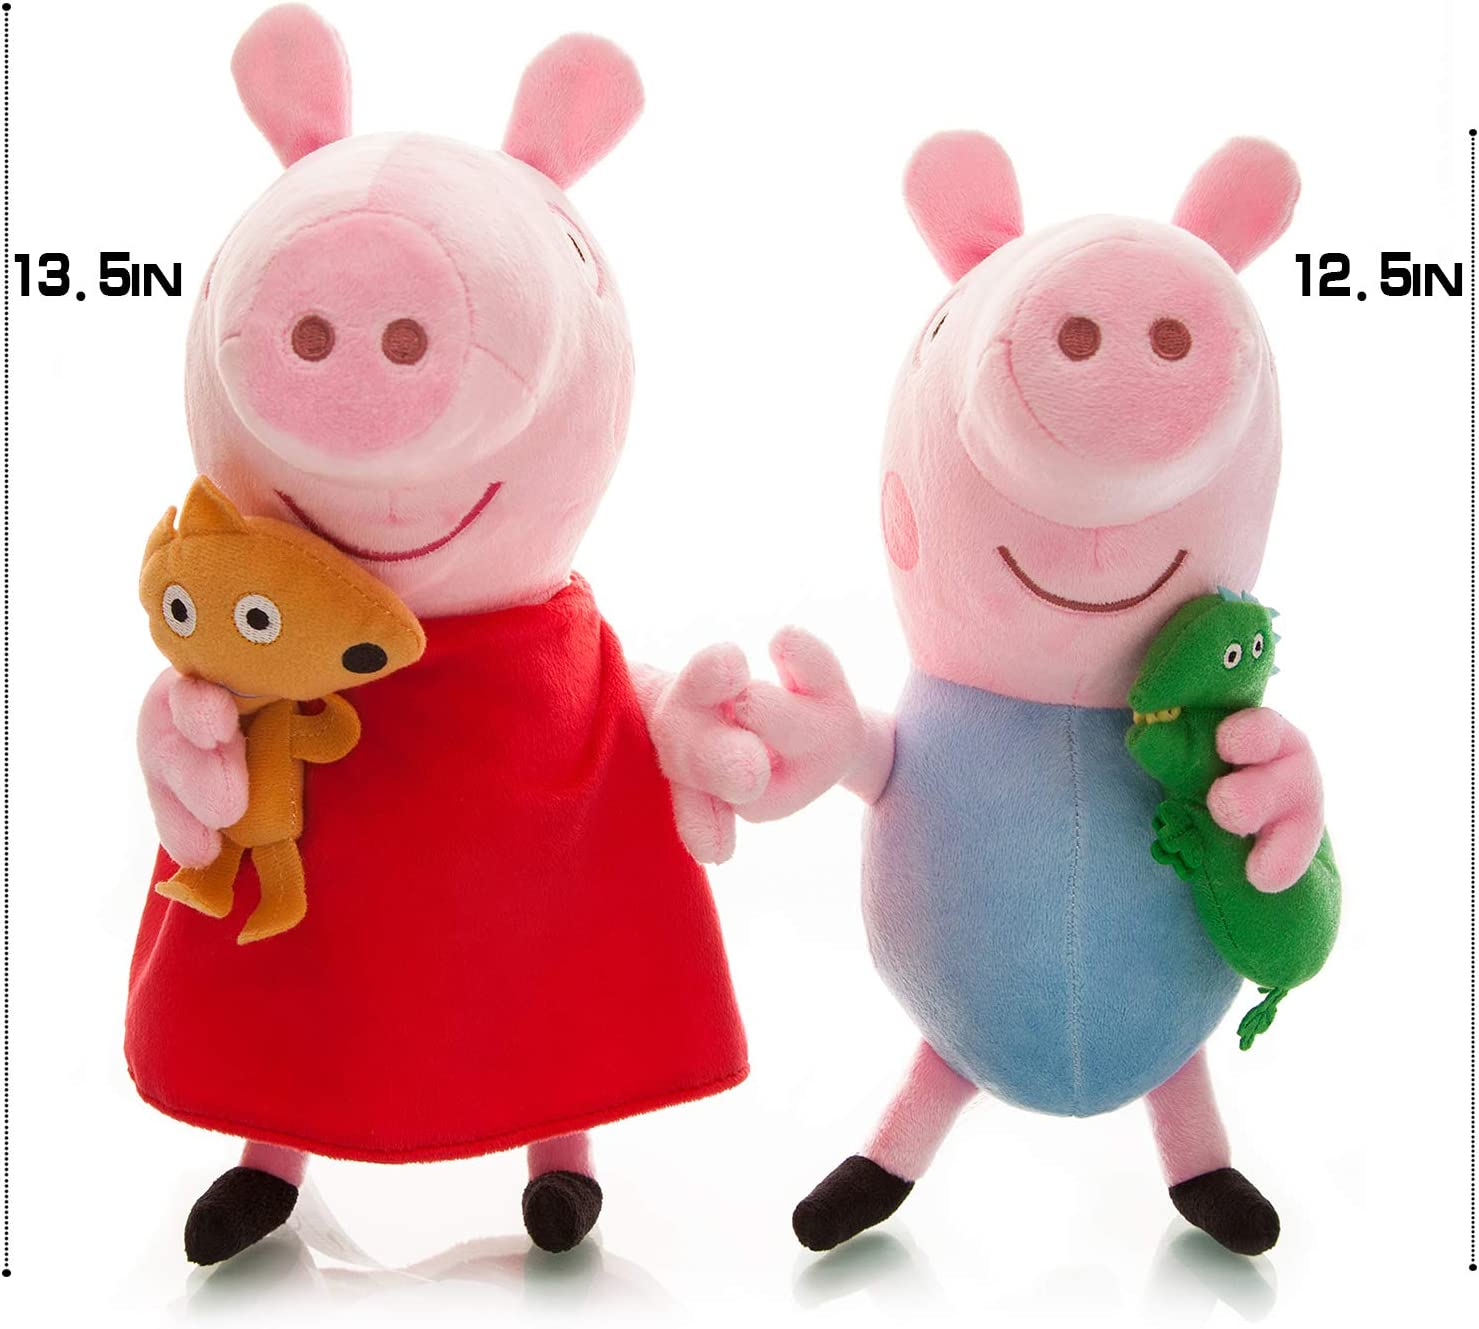 Plush Pig Baby Toys 2pcs Size 13.5 12.5 Toys for Babies Toys ...